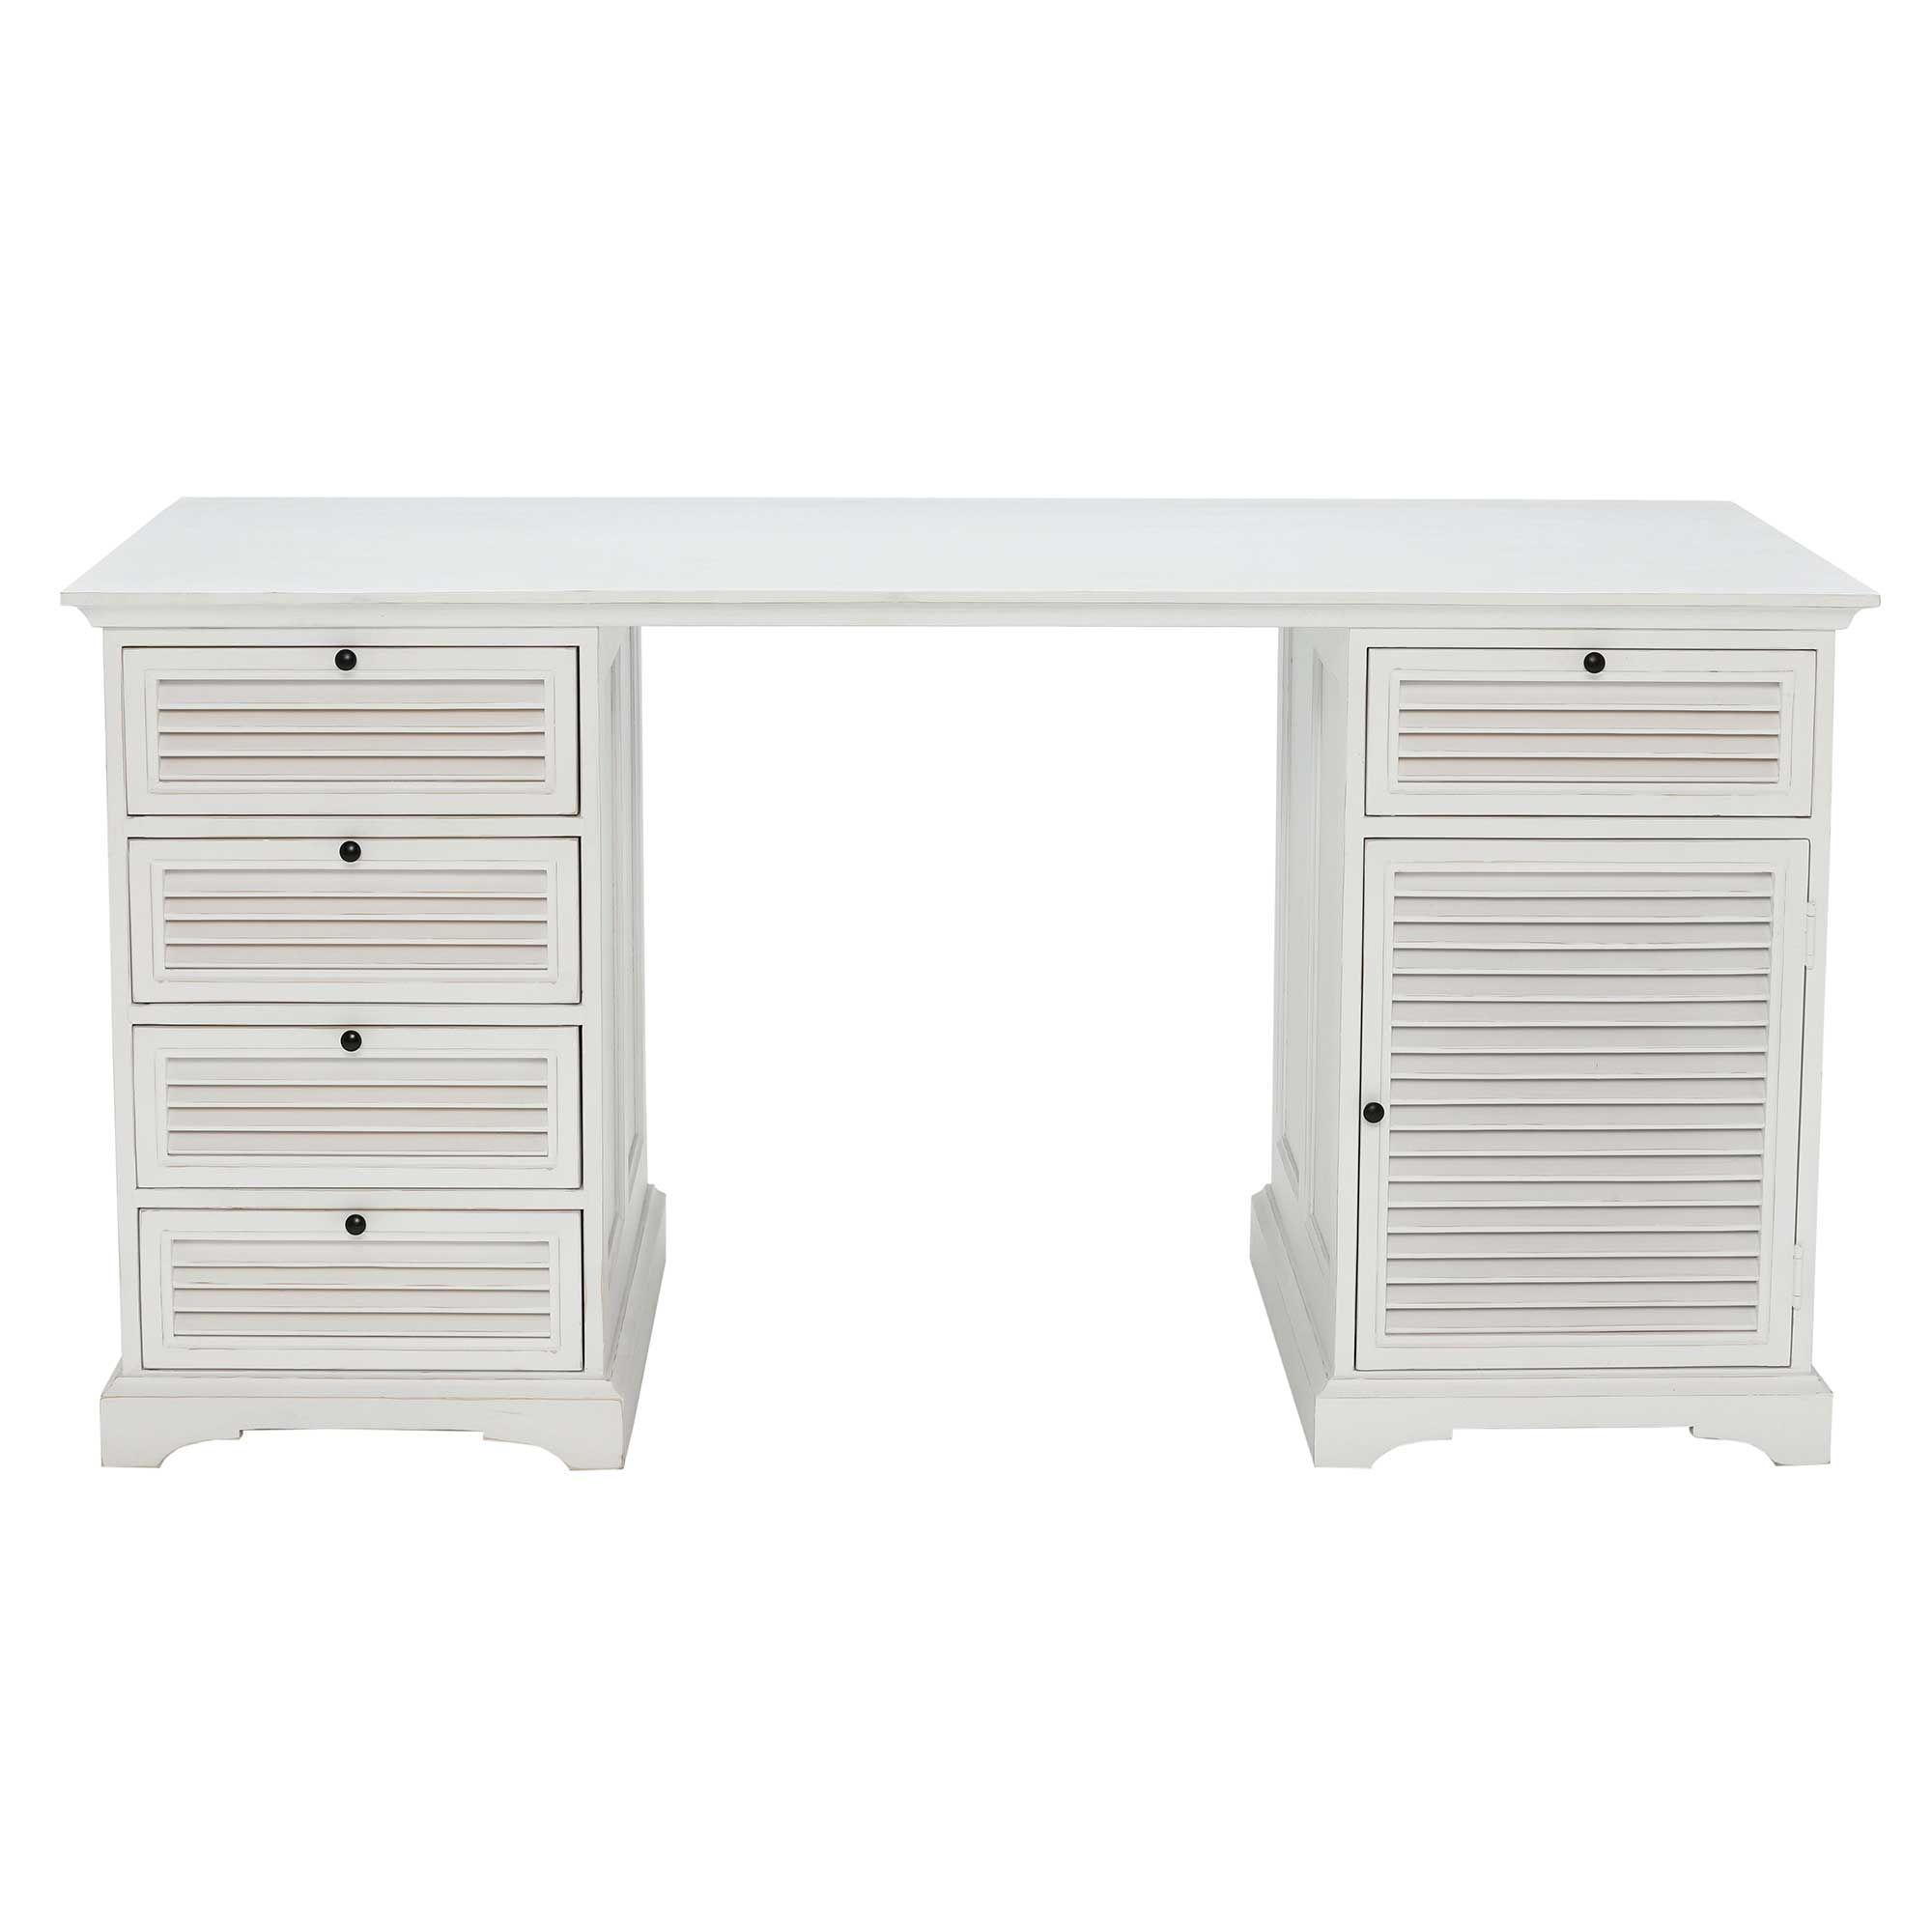 valatella double pedestal desk antique white dressing tables rh pinterest com